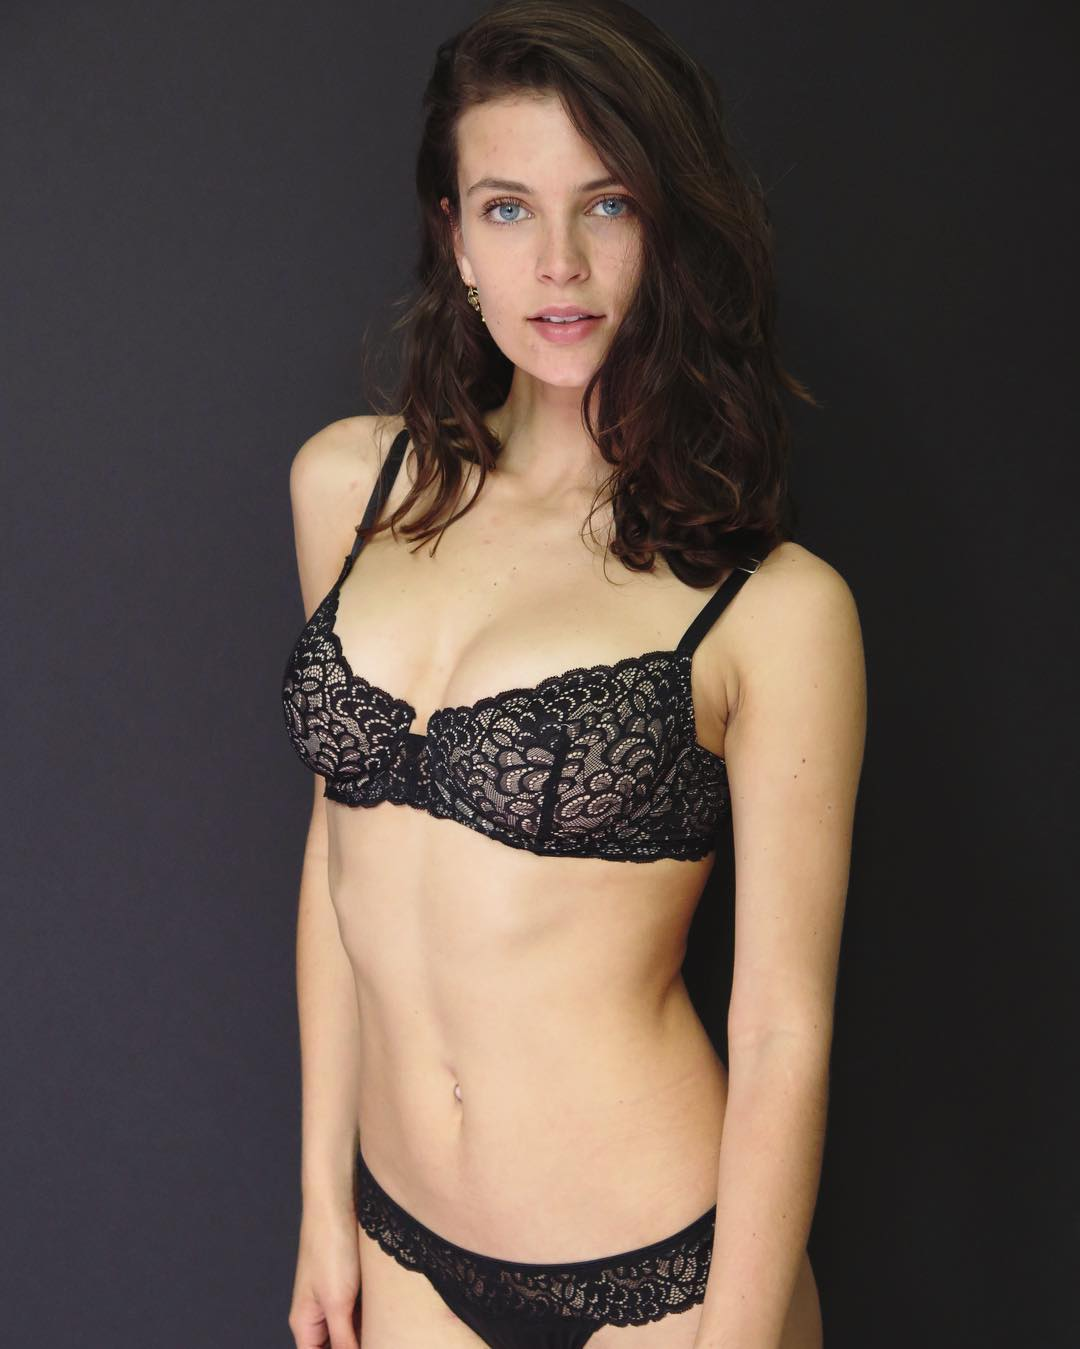 Pics Kathleen Sorbara naked (52 foto and video), Tits, Paparazzi, Selfie, butt 2018